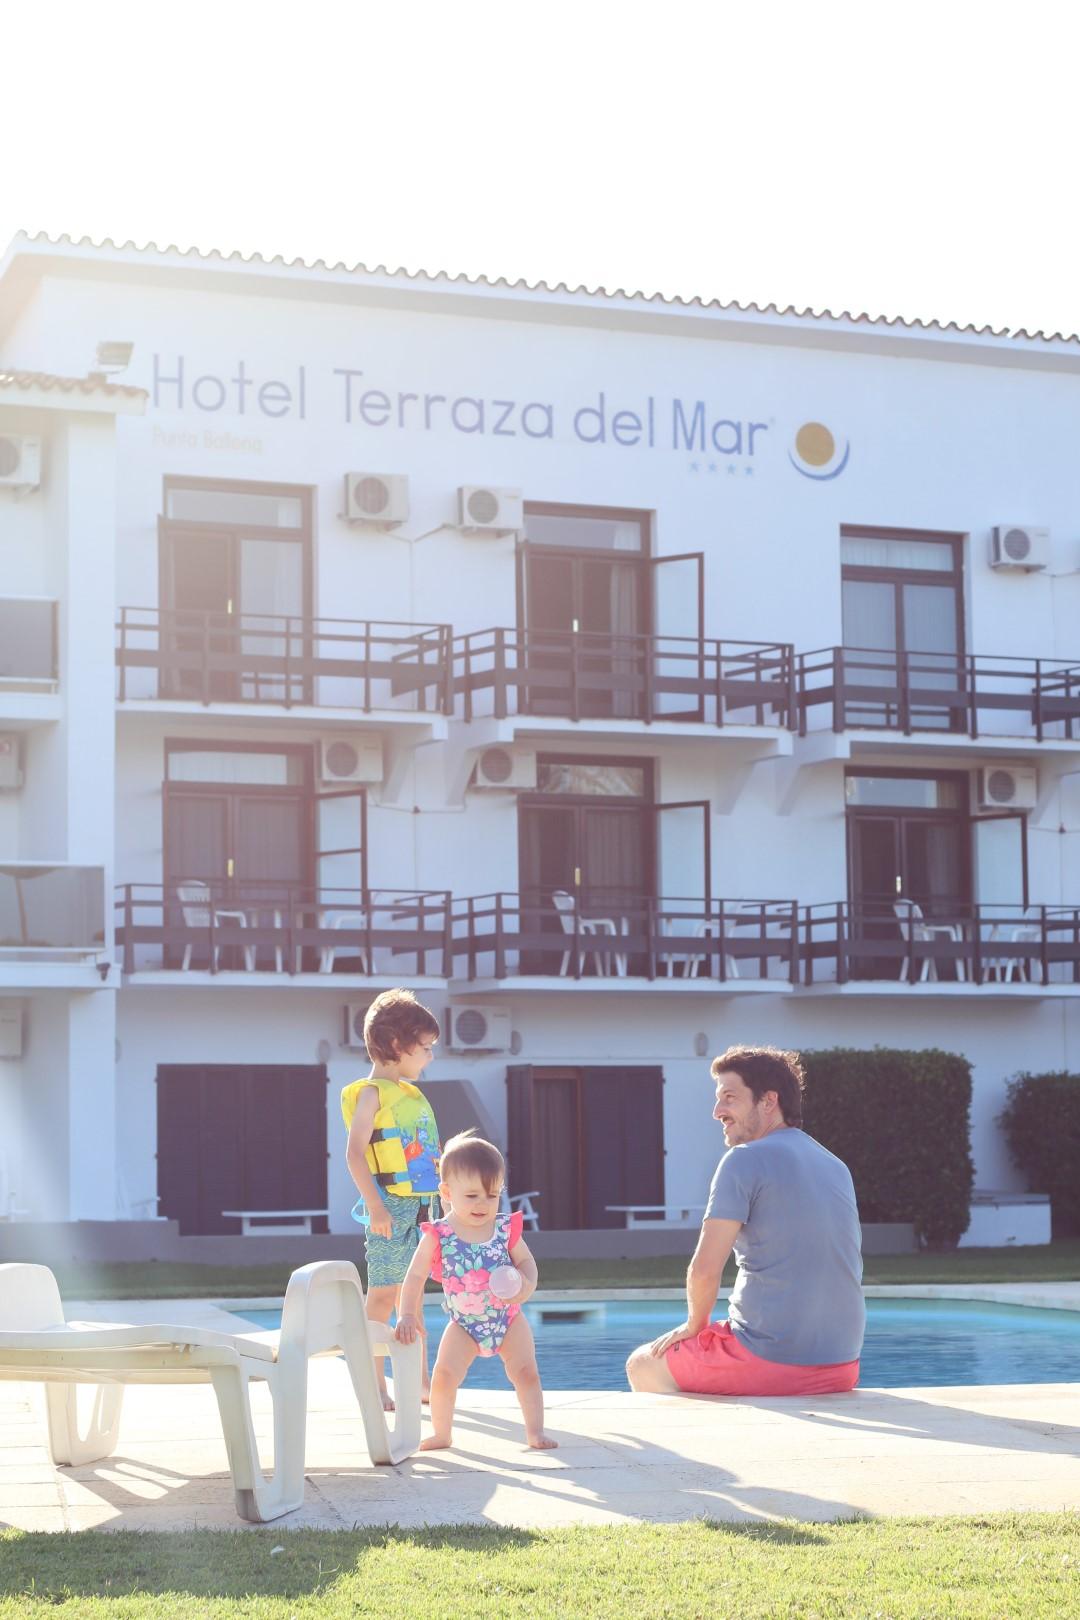 hotel terraza del mar, playa, uruguay